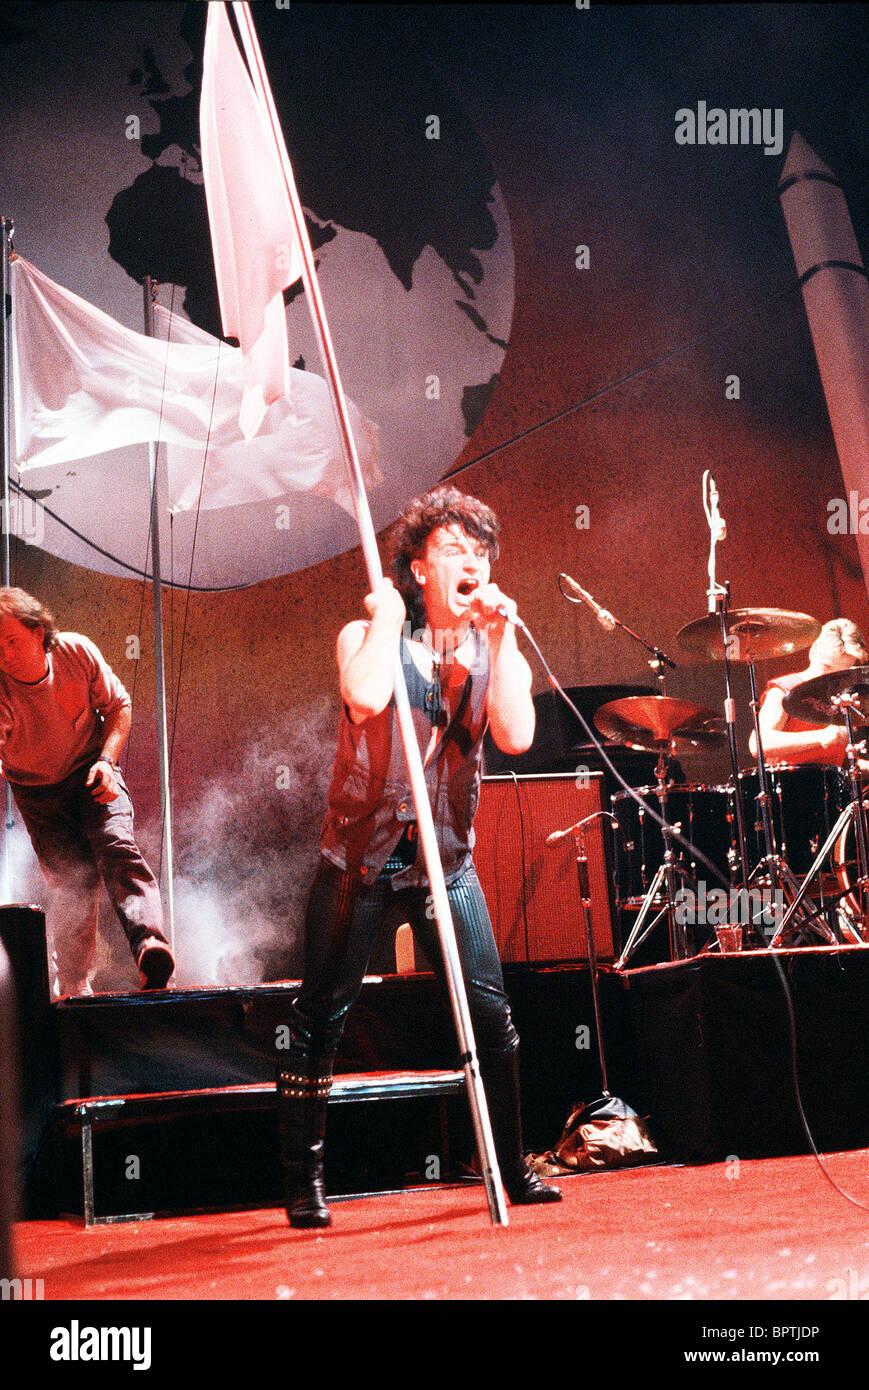 BONO POP GROUP 'U2' (1984) - Stock Image